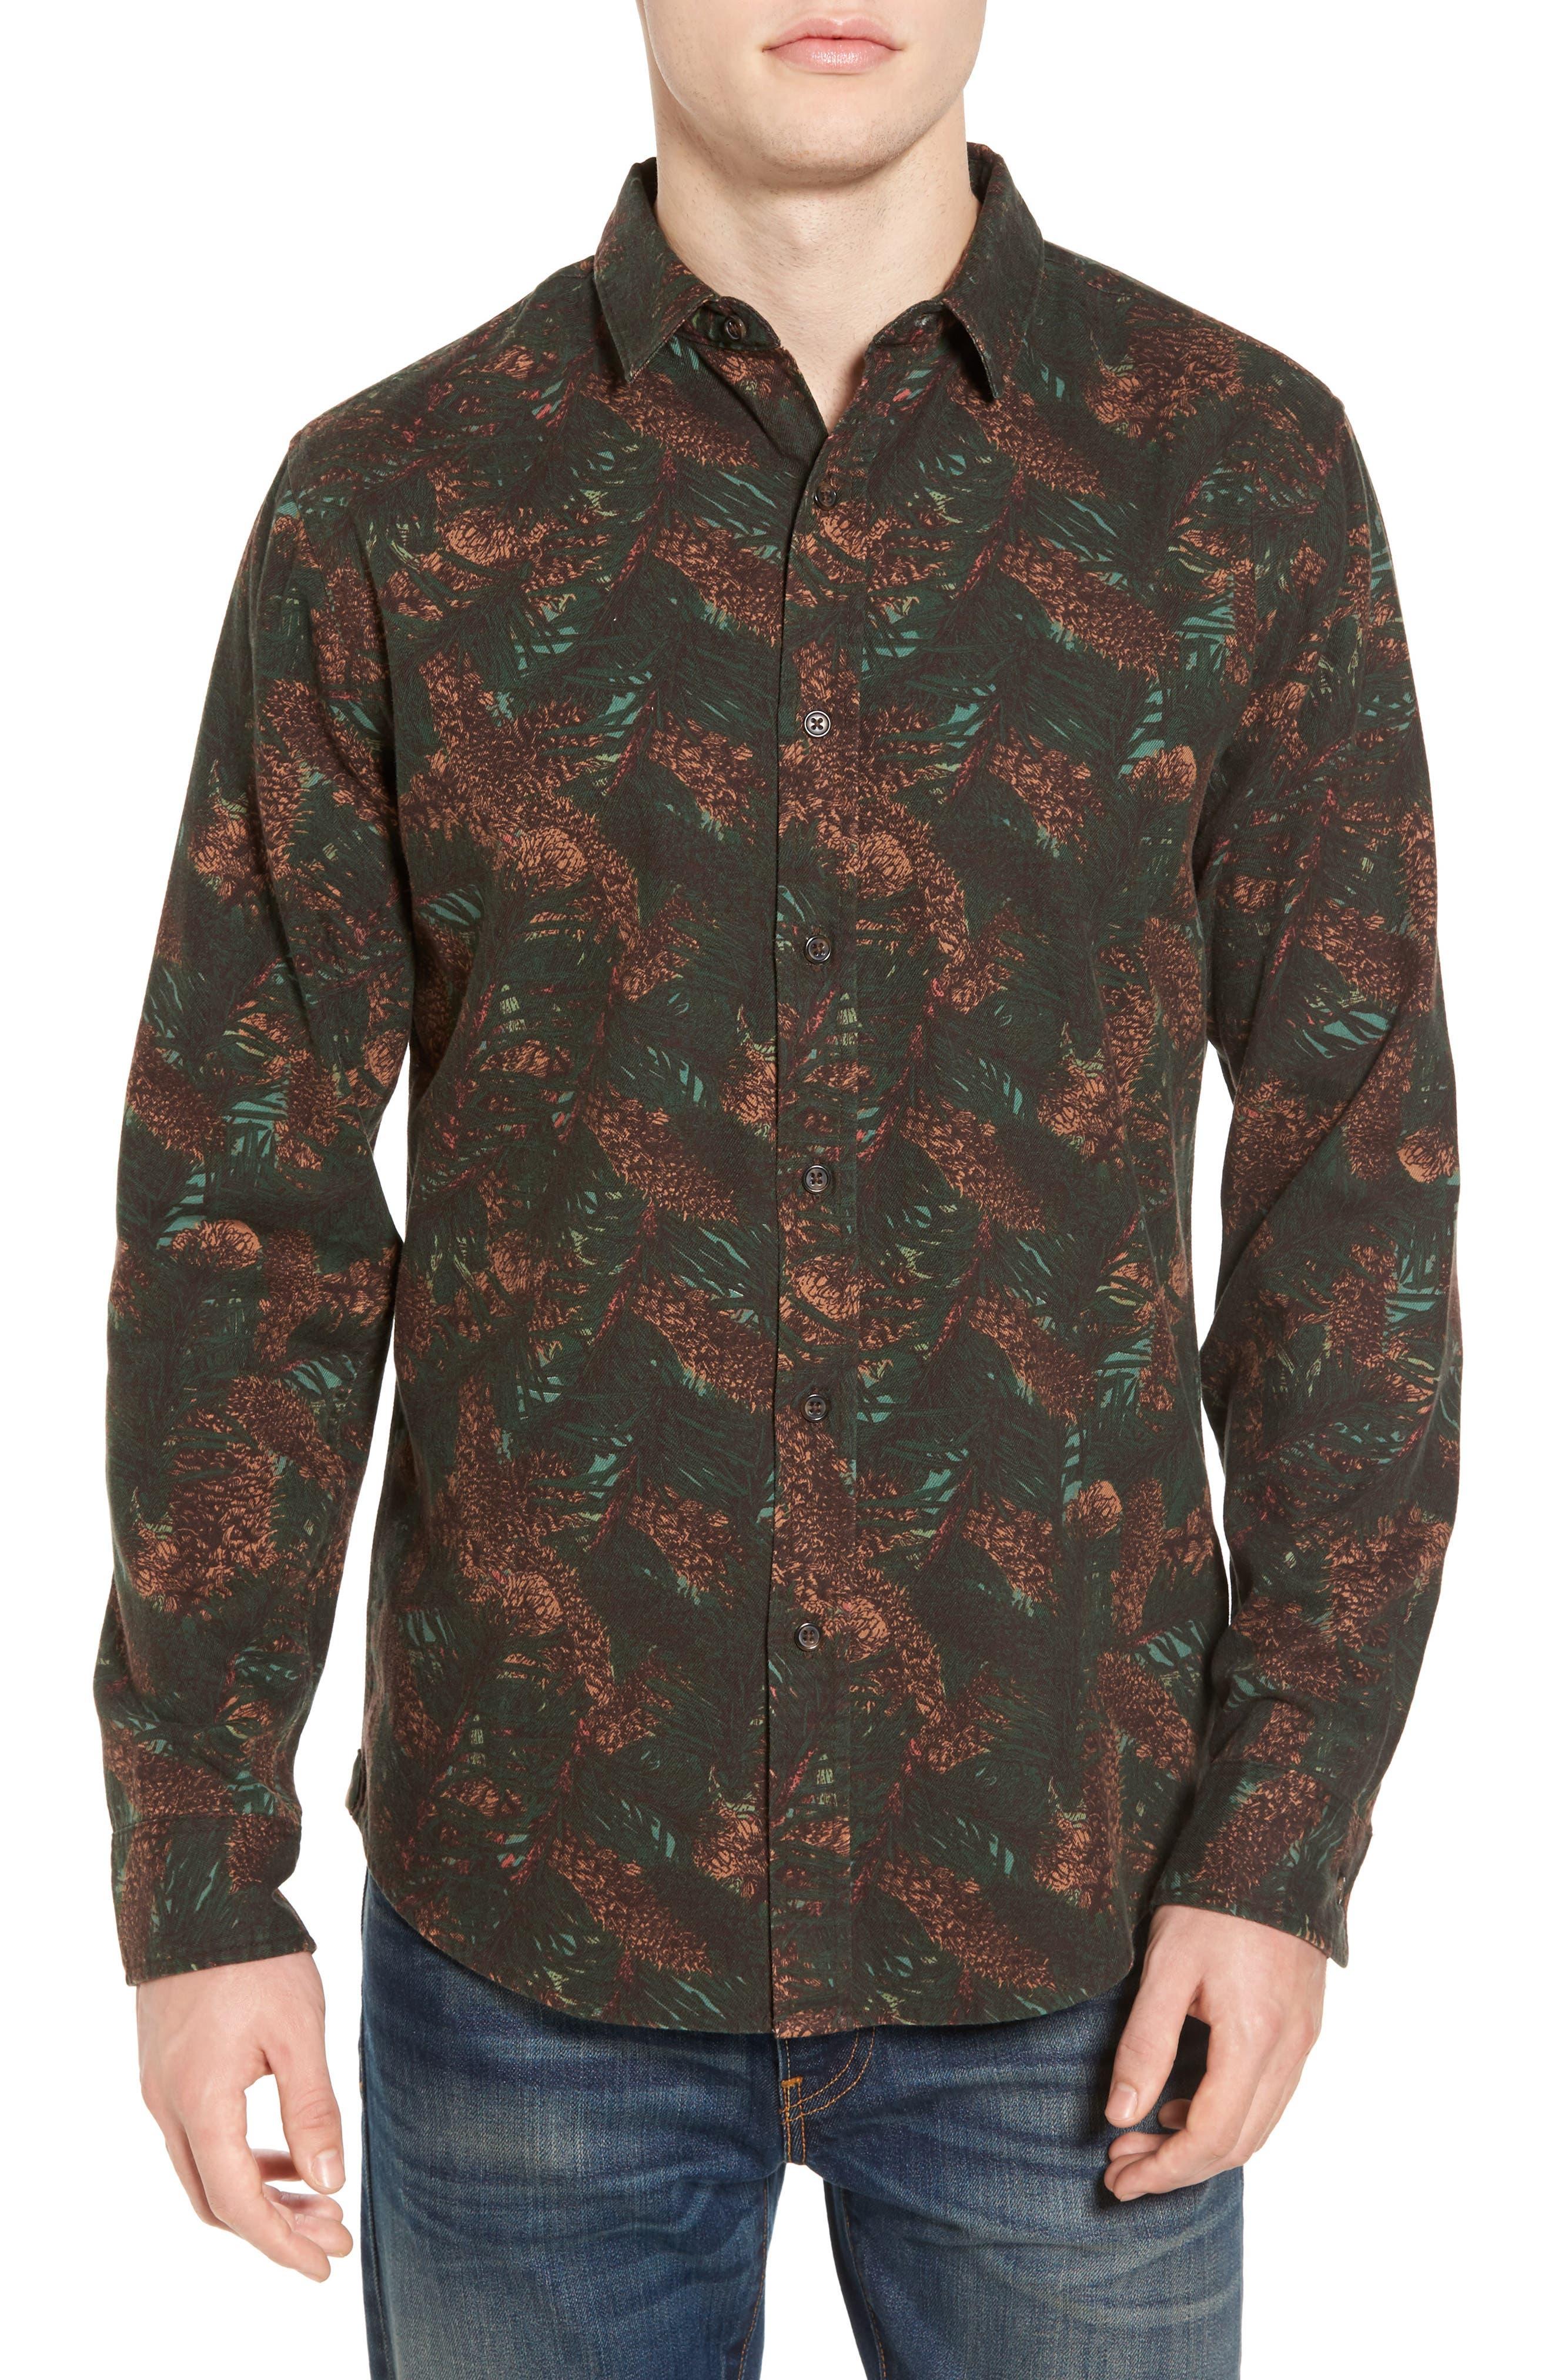 Alternate Image 1 Selected - 1901 Print Flannel Shirt